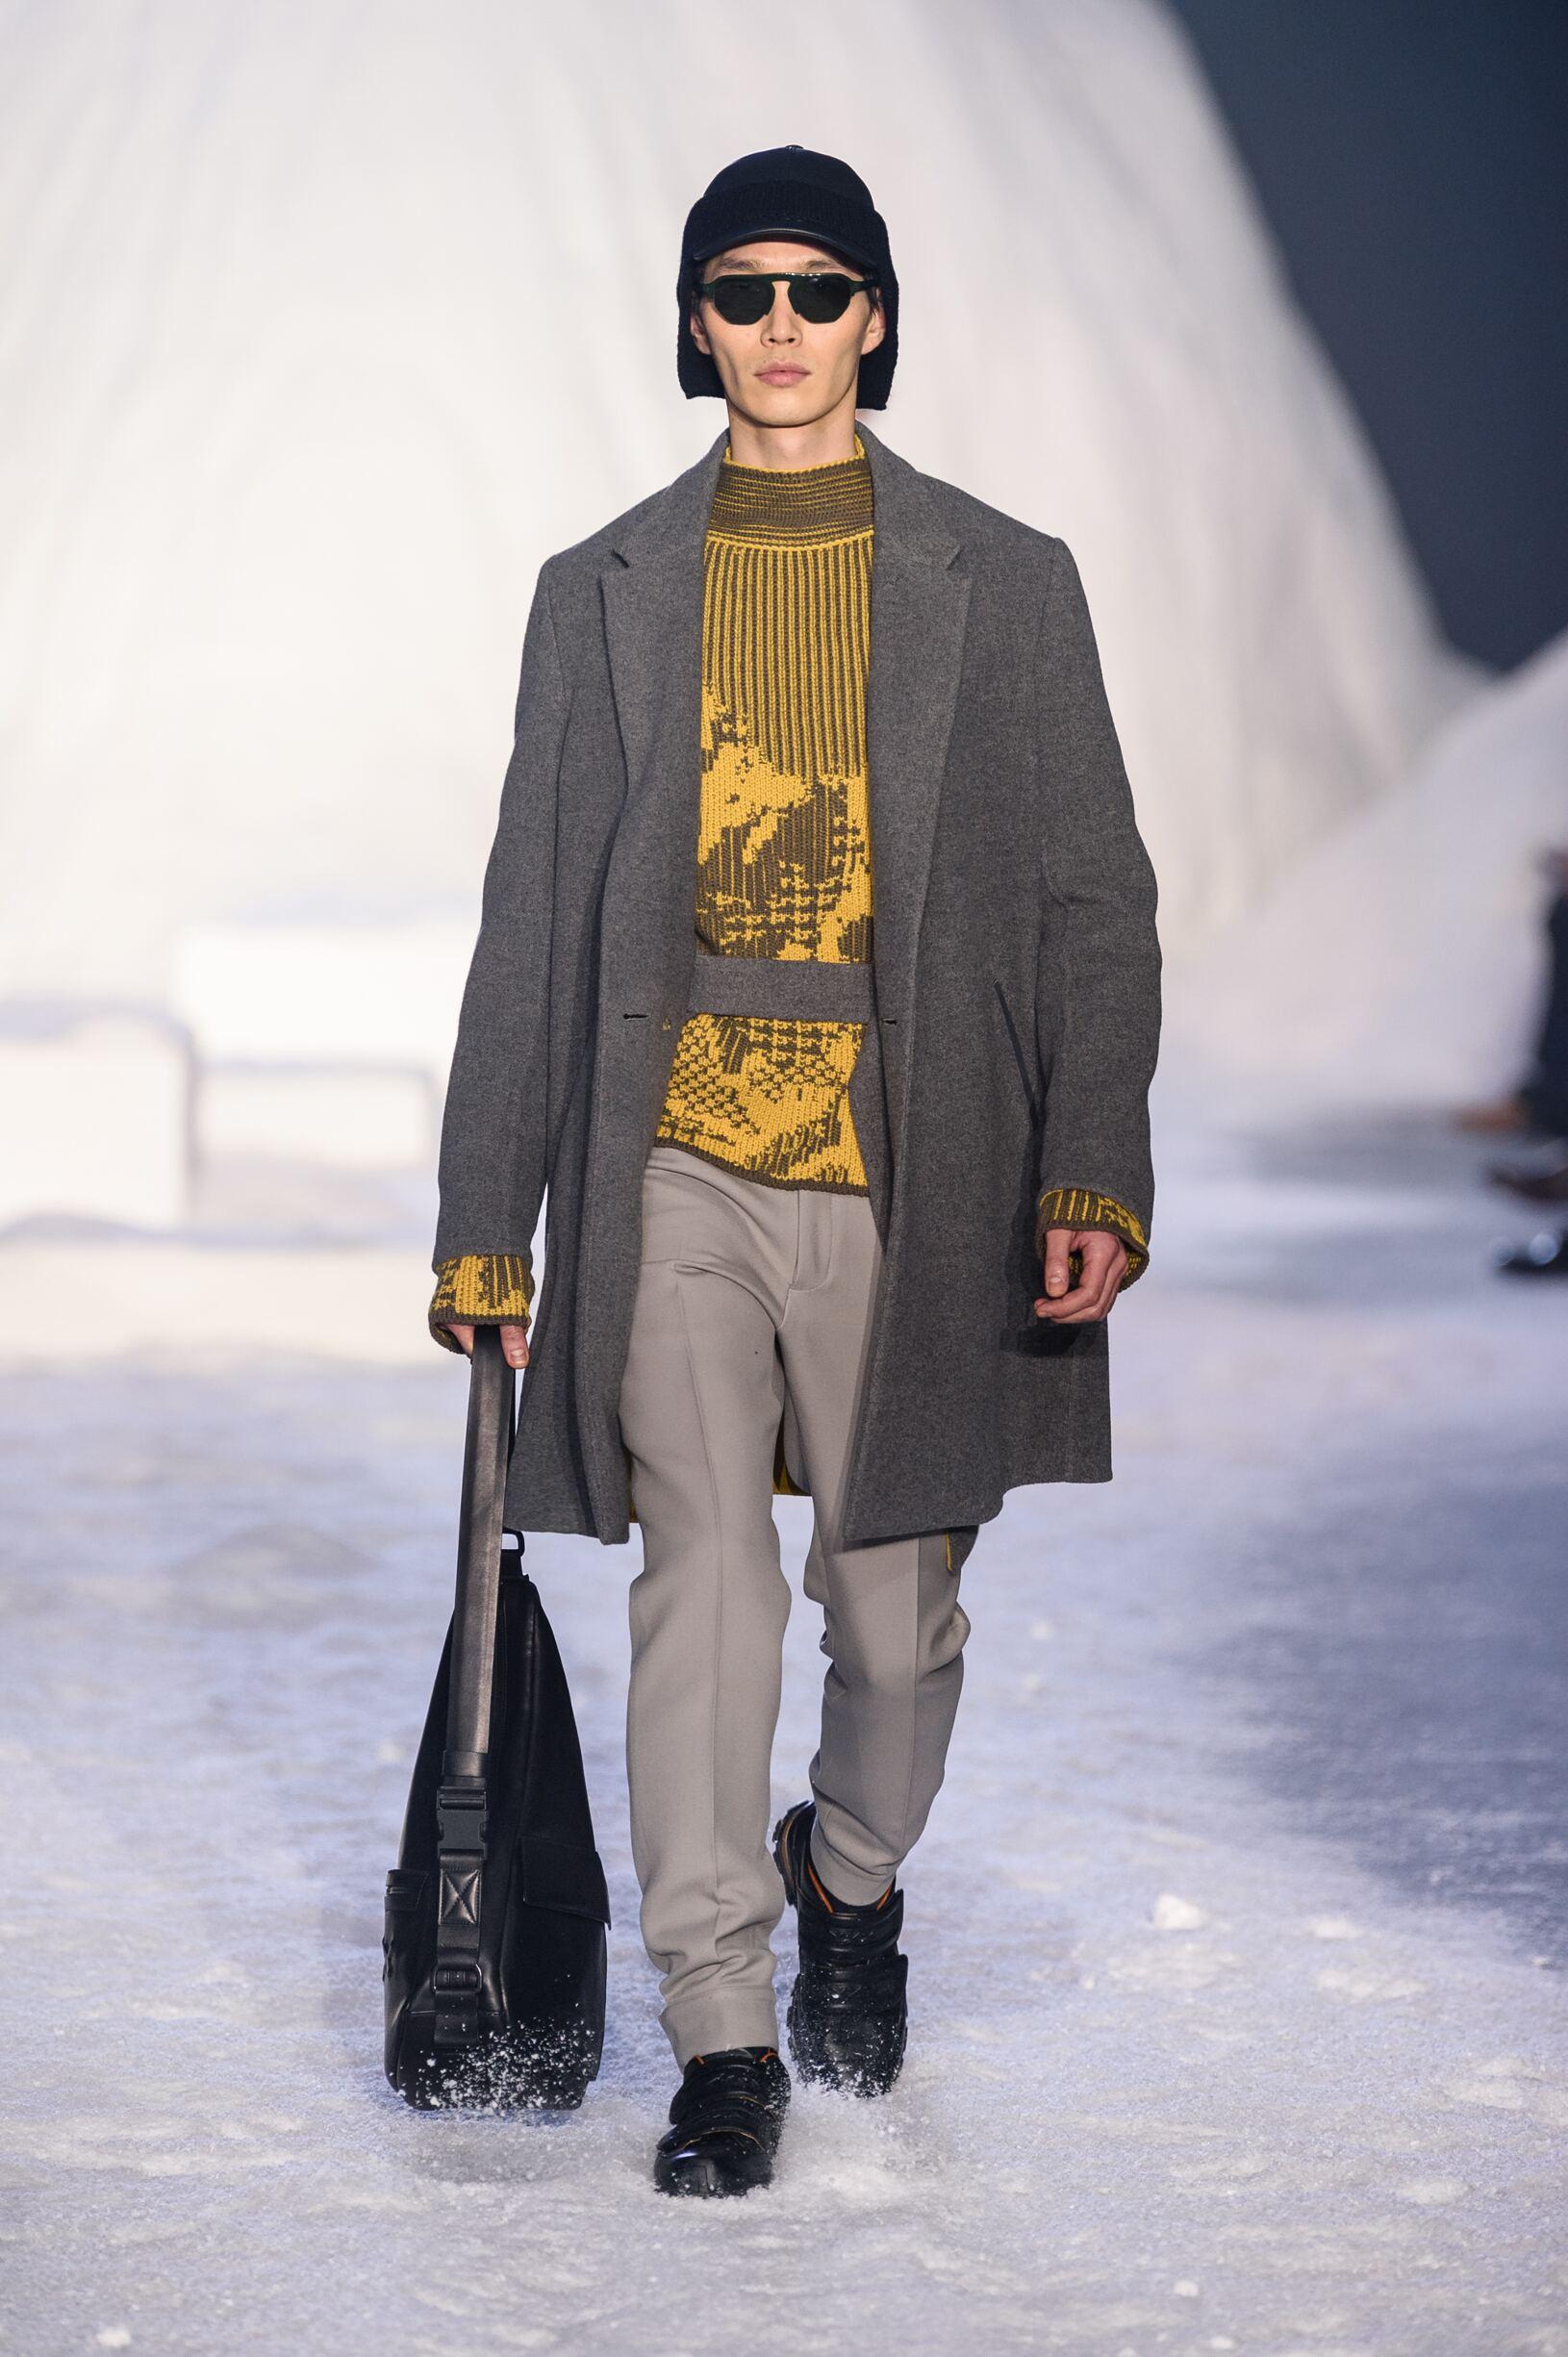 Winter 2018 Man Trends Ermenegildo Zegna Couture